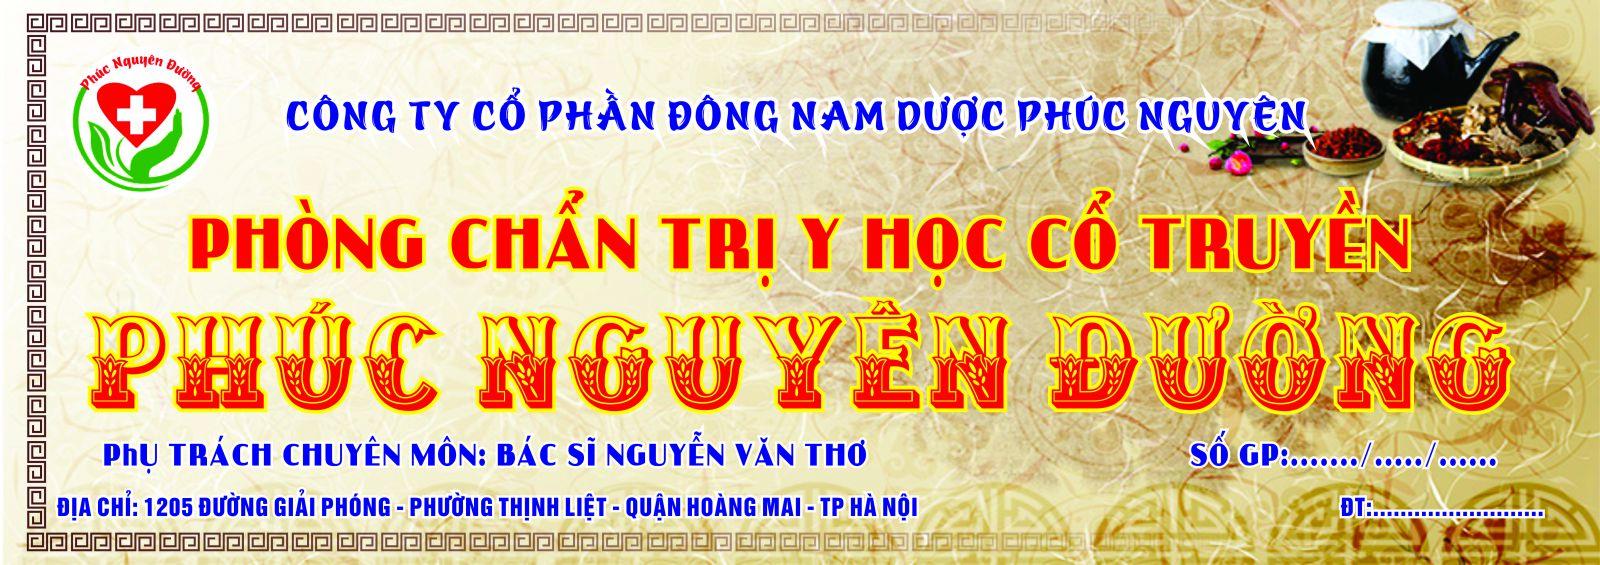 http://yduocphucnguyen.com.vn/admin/